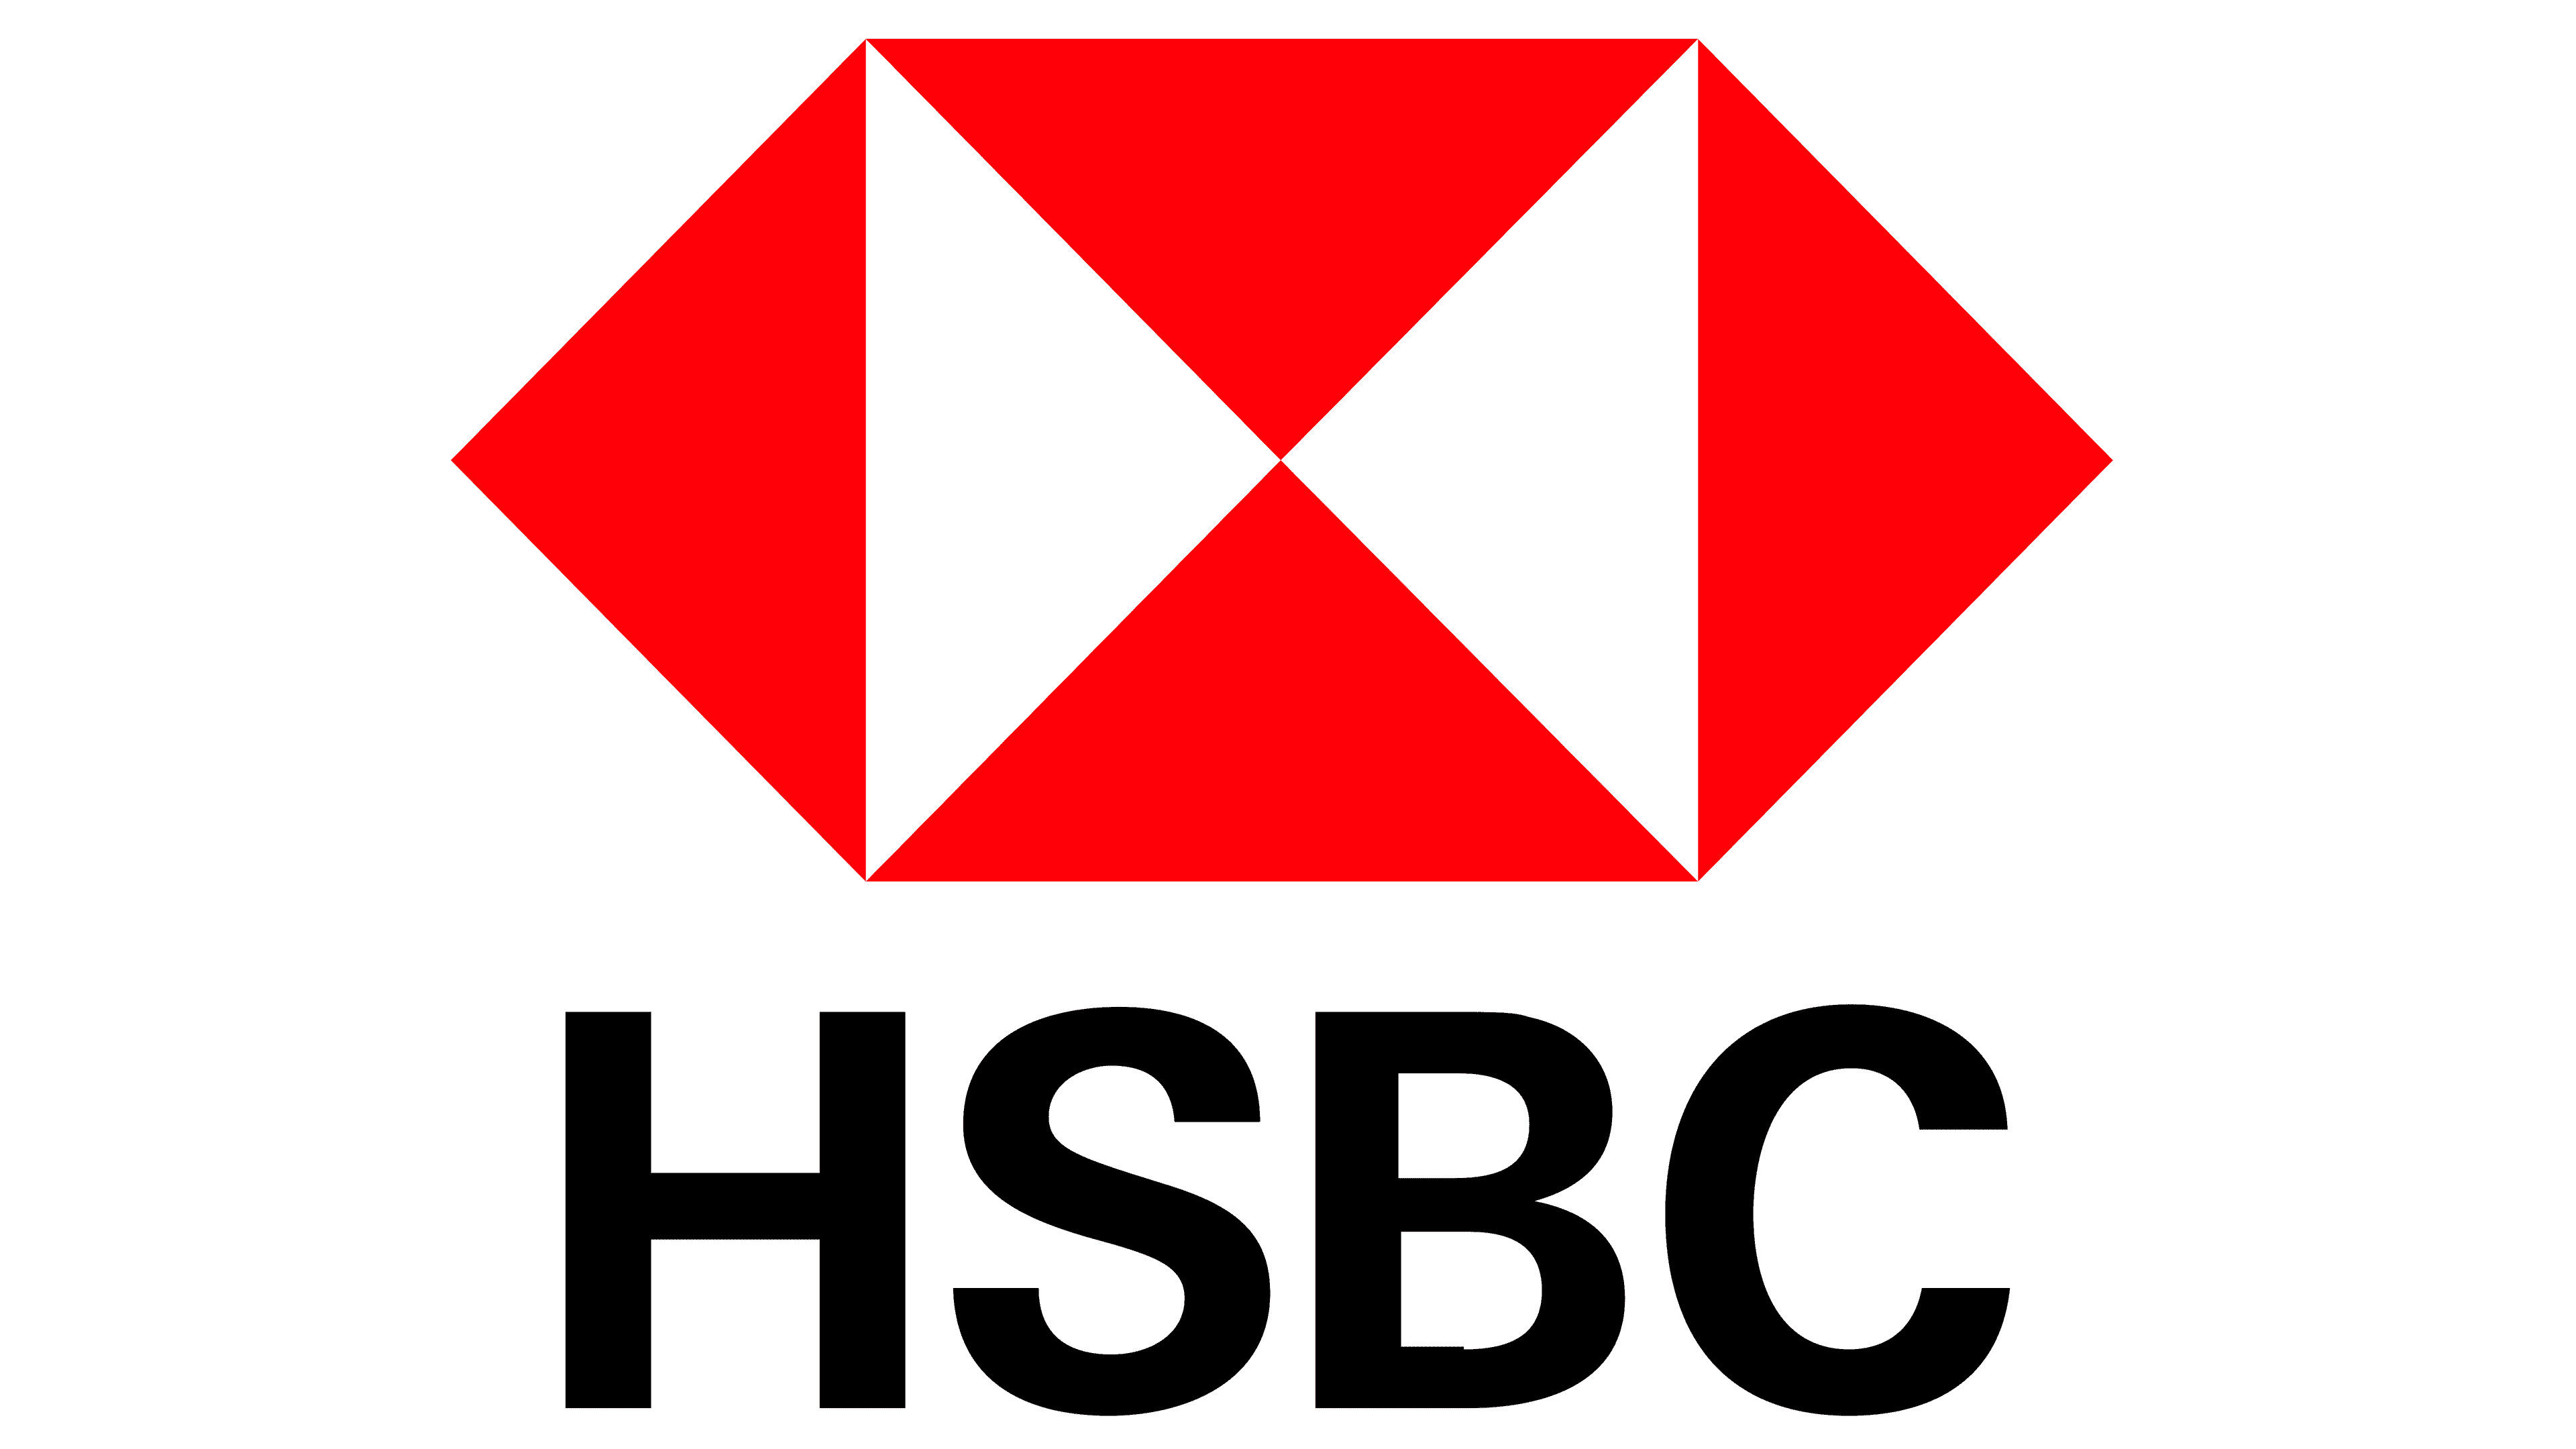 HSBC-Symbol